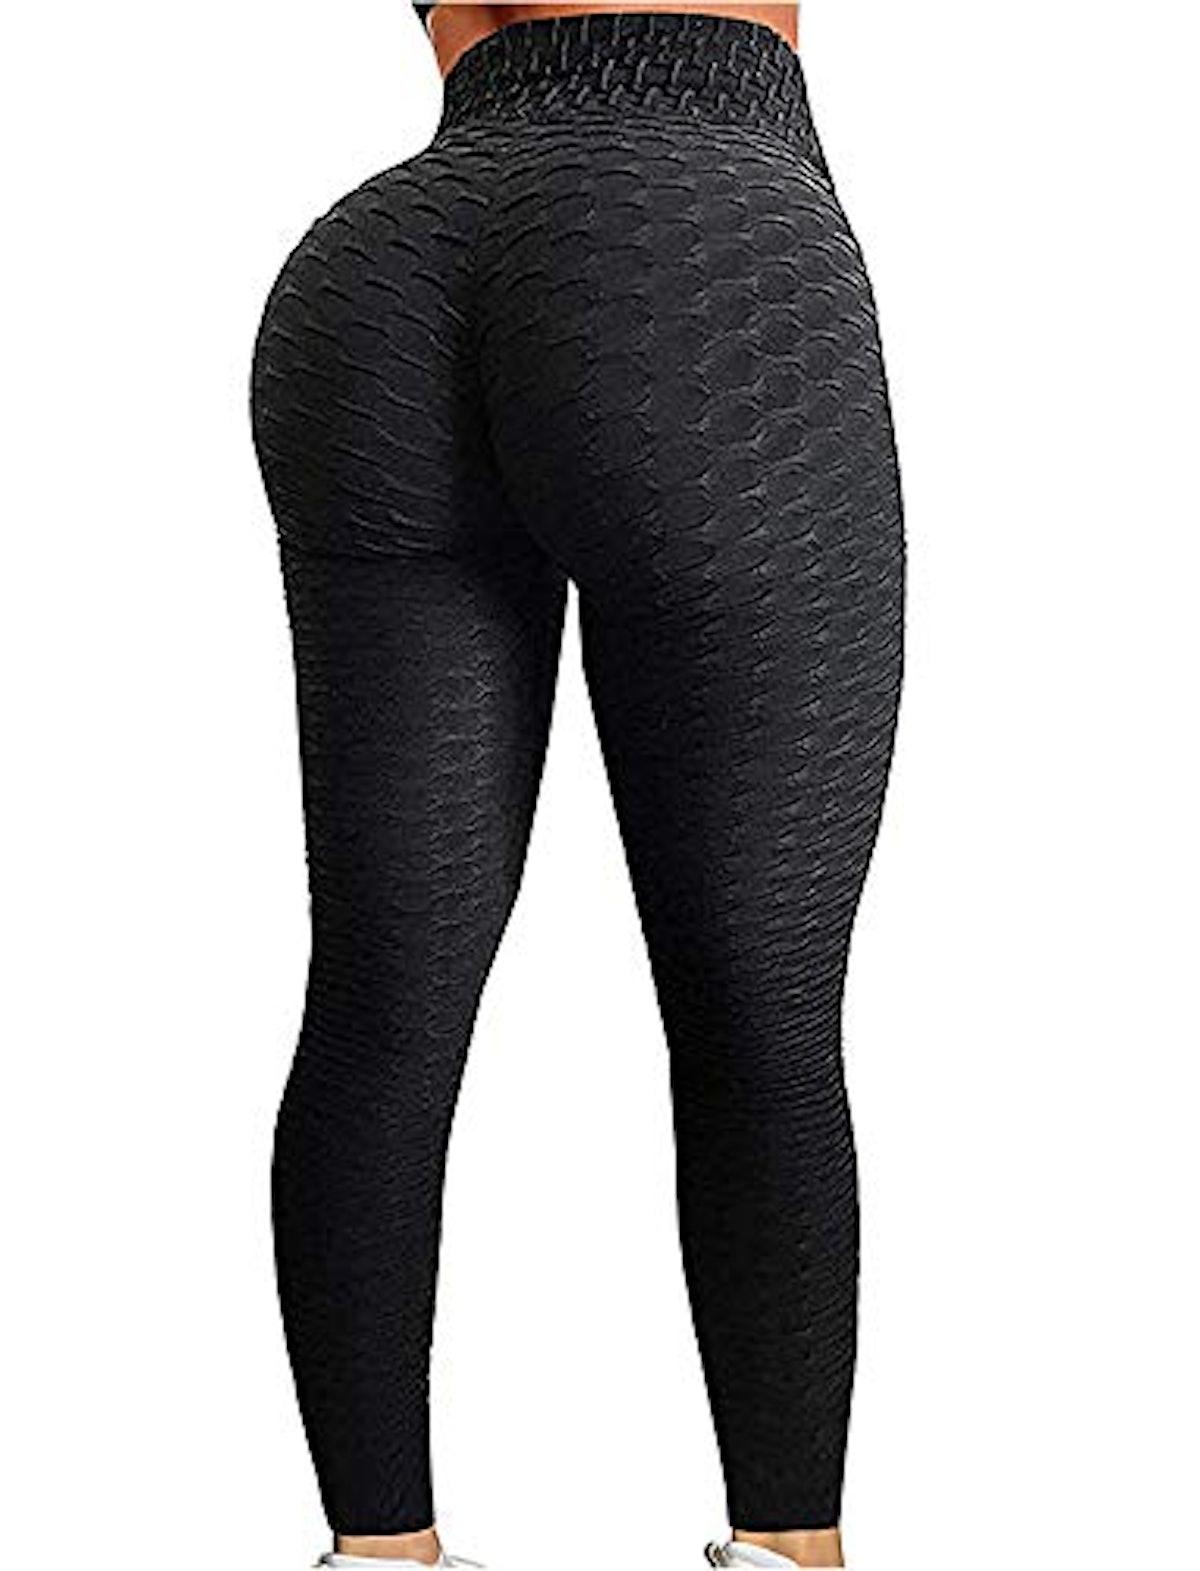 SEASUM Women's High Waist Yoga Pants